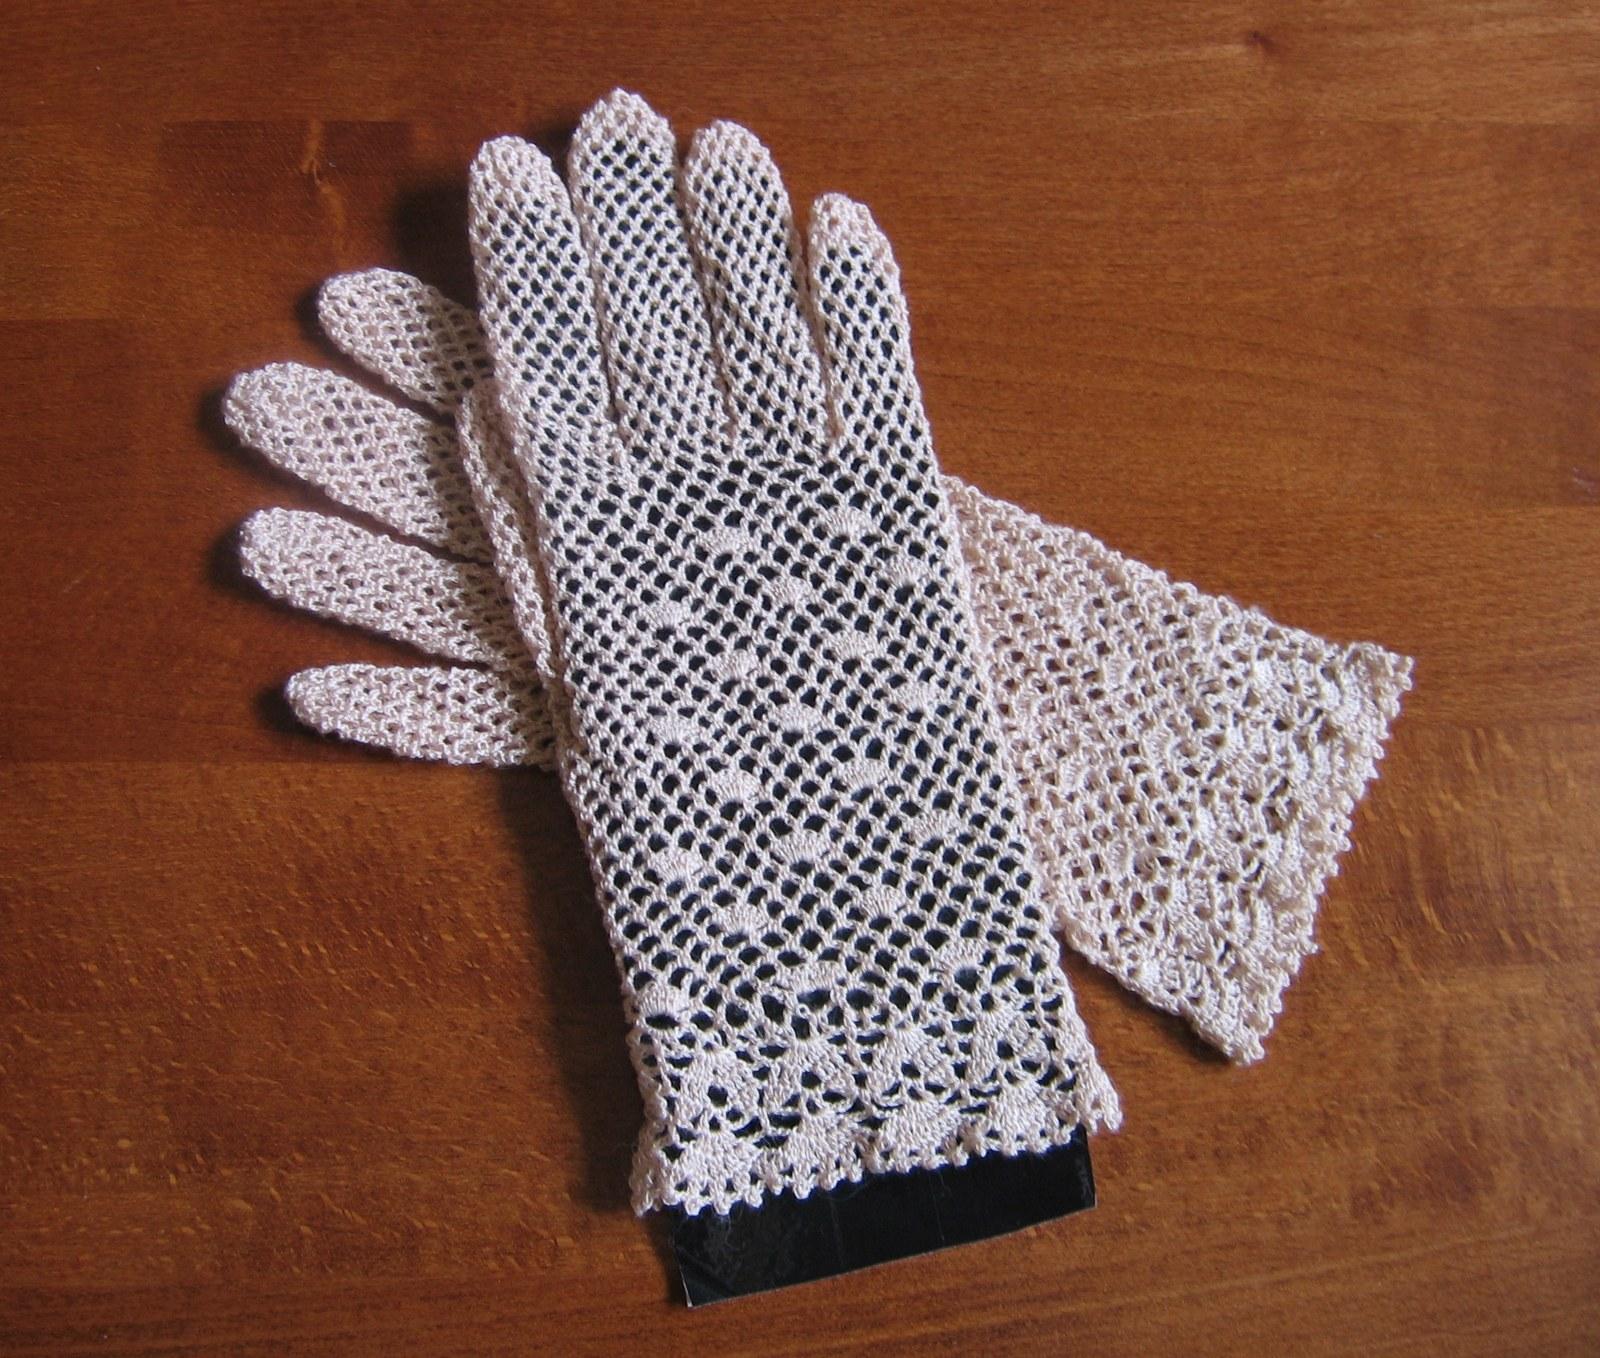 788eaf233e0 bílé krajkové rukavičky   Zboží prodejce Perlorodka